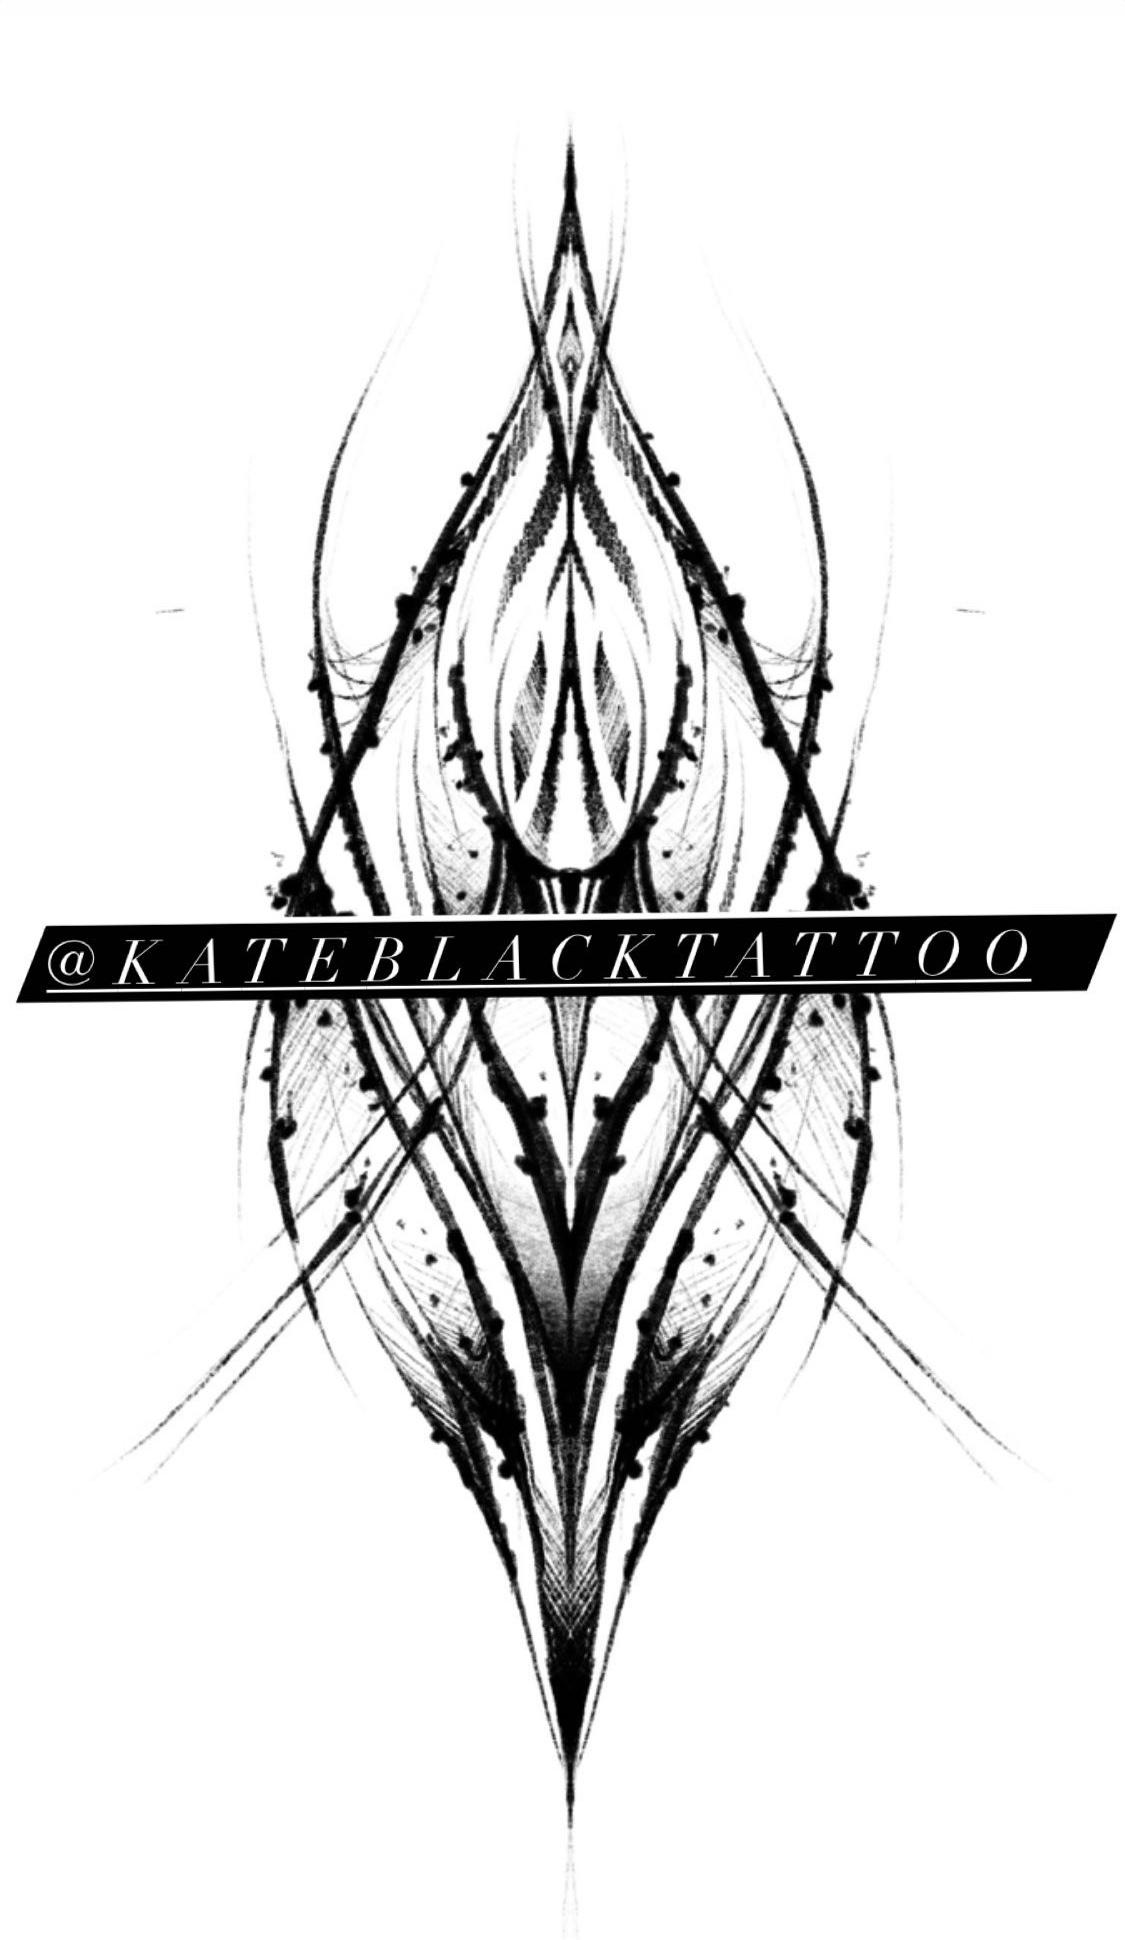 Inksearch tattoo Kate Black